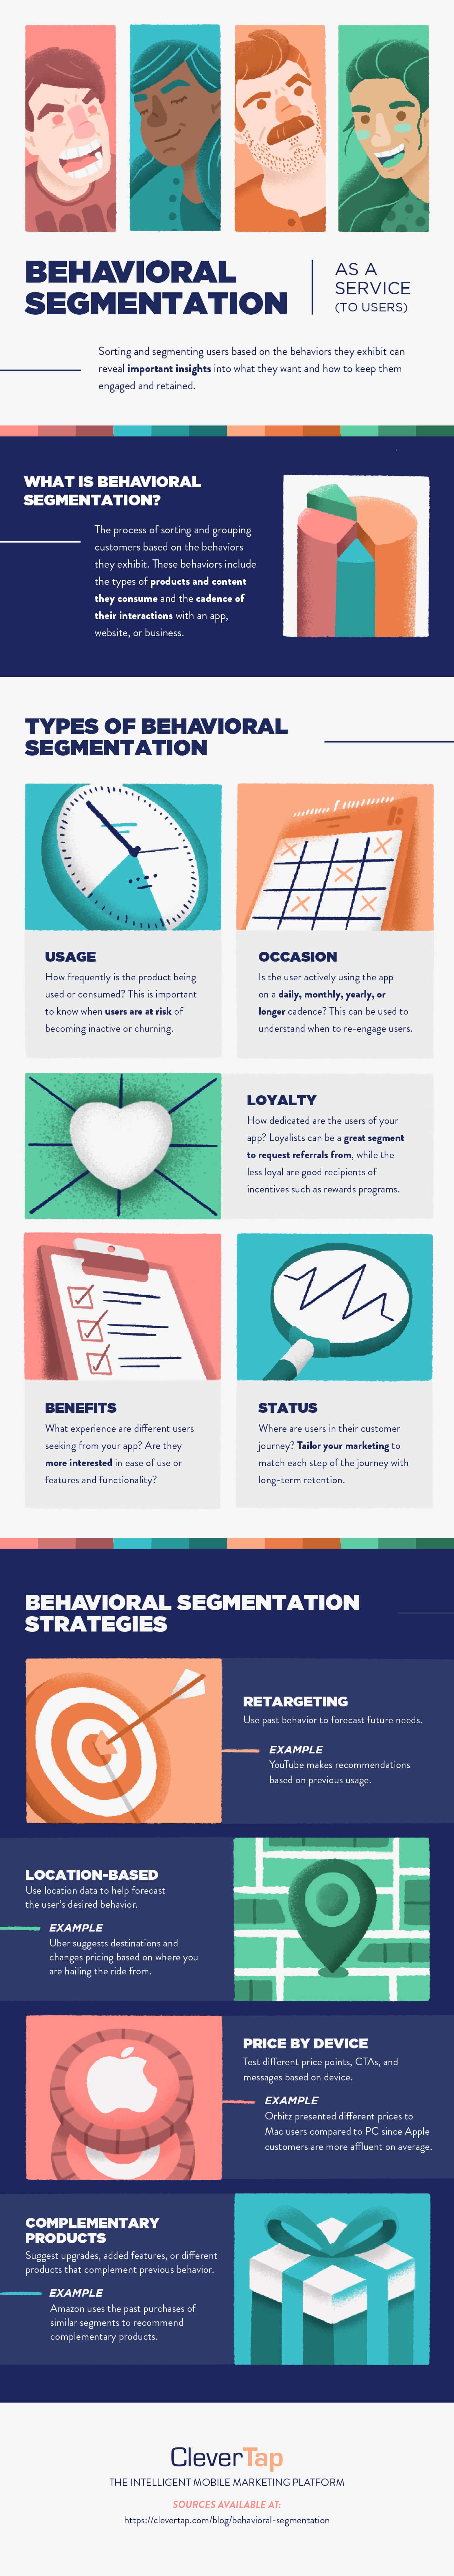 behavioral segmentation infographic